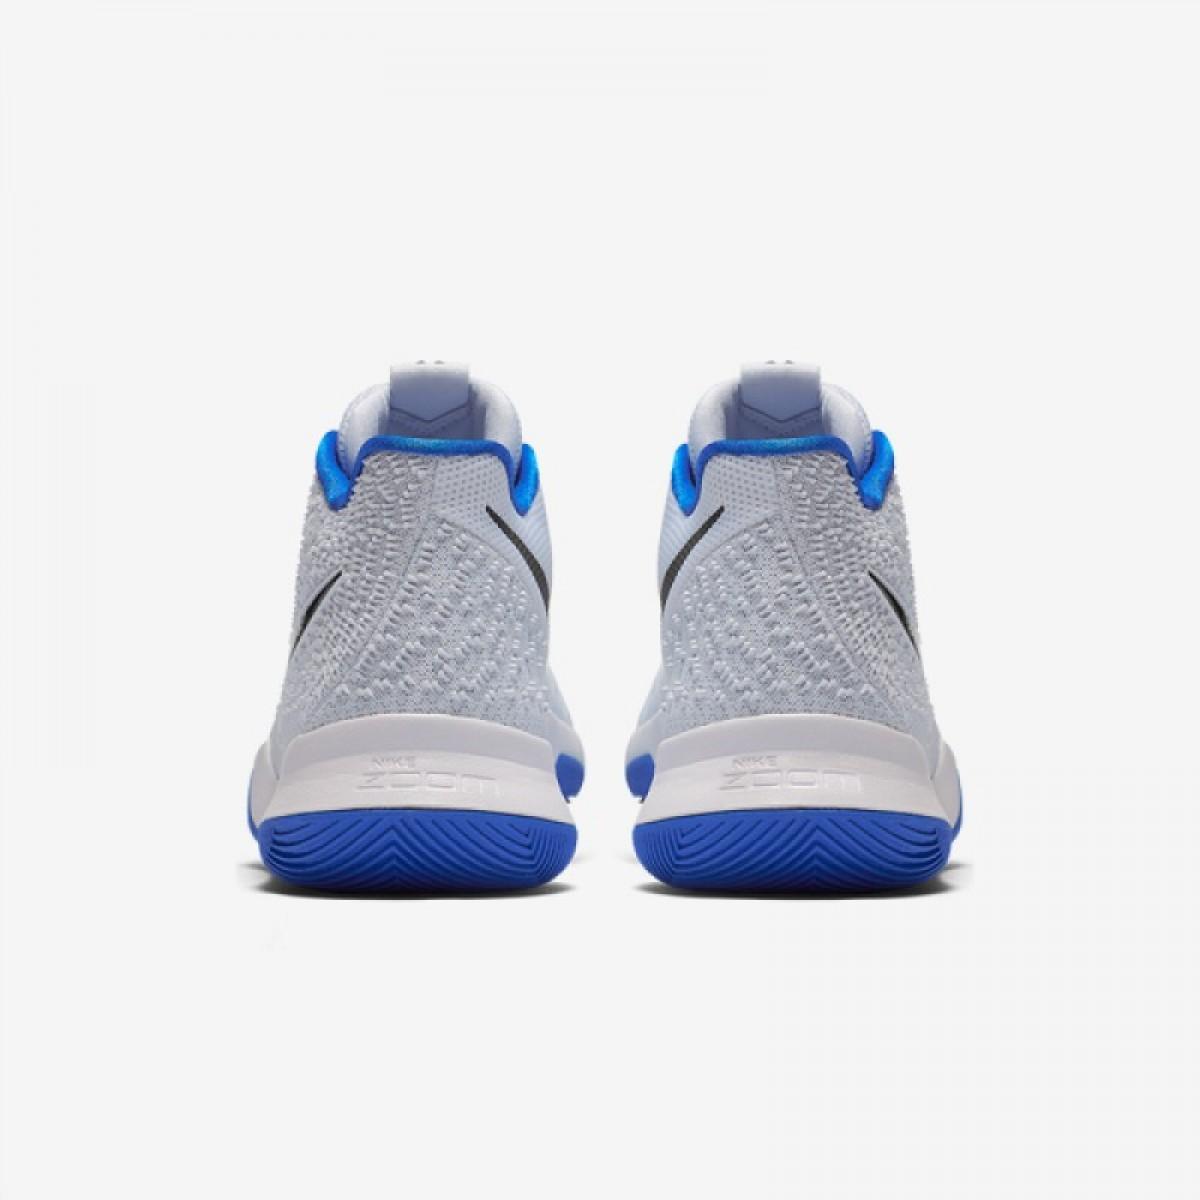 Comprar Nike Kyrie 3 GS 'Brotherhood' 859466-102Comprar Nike Kyrie 3 GS 'Brotherhood' 859466-102